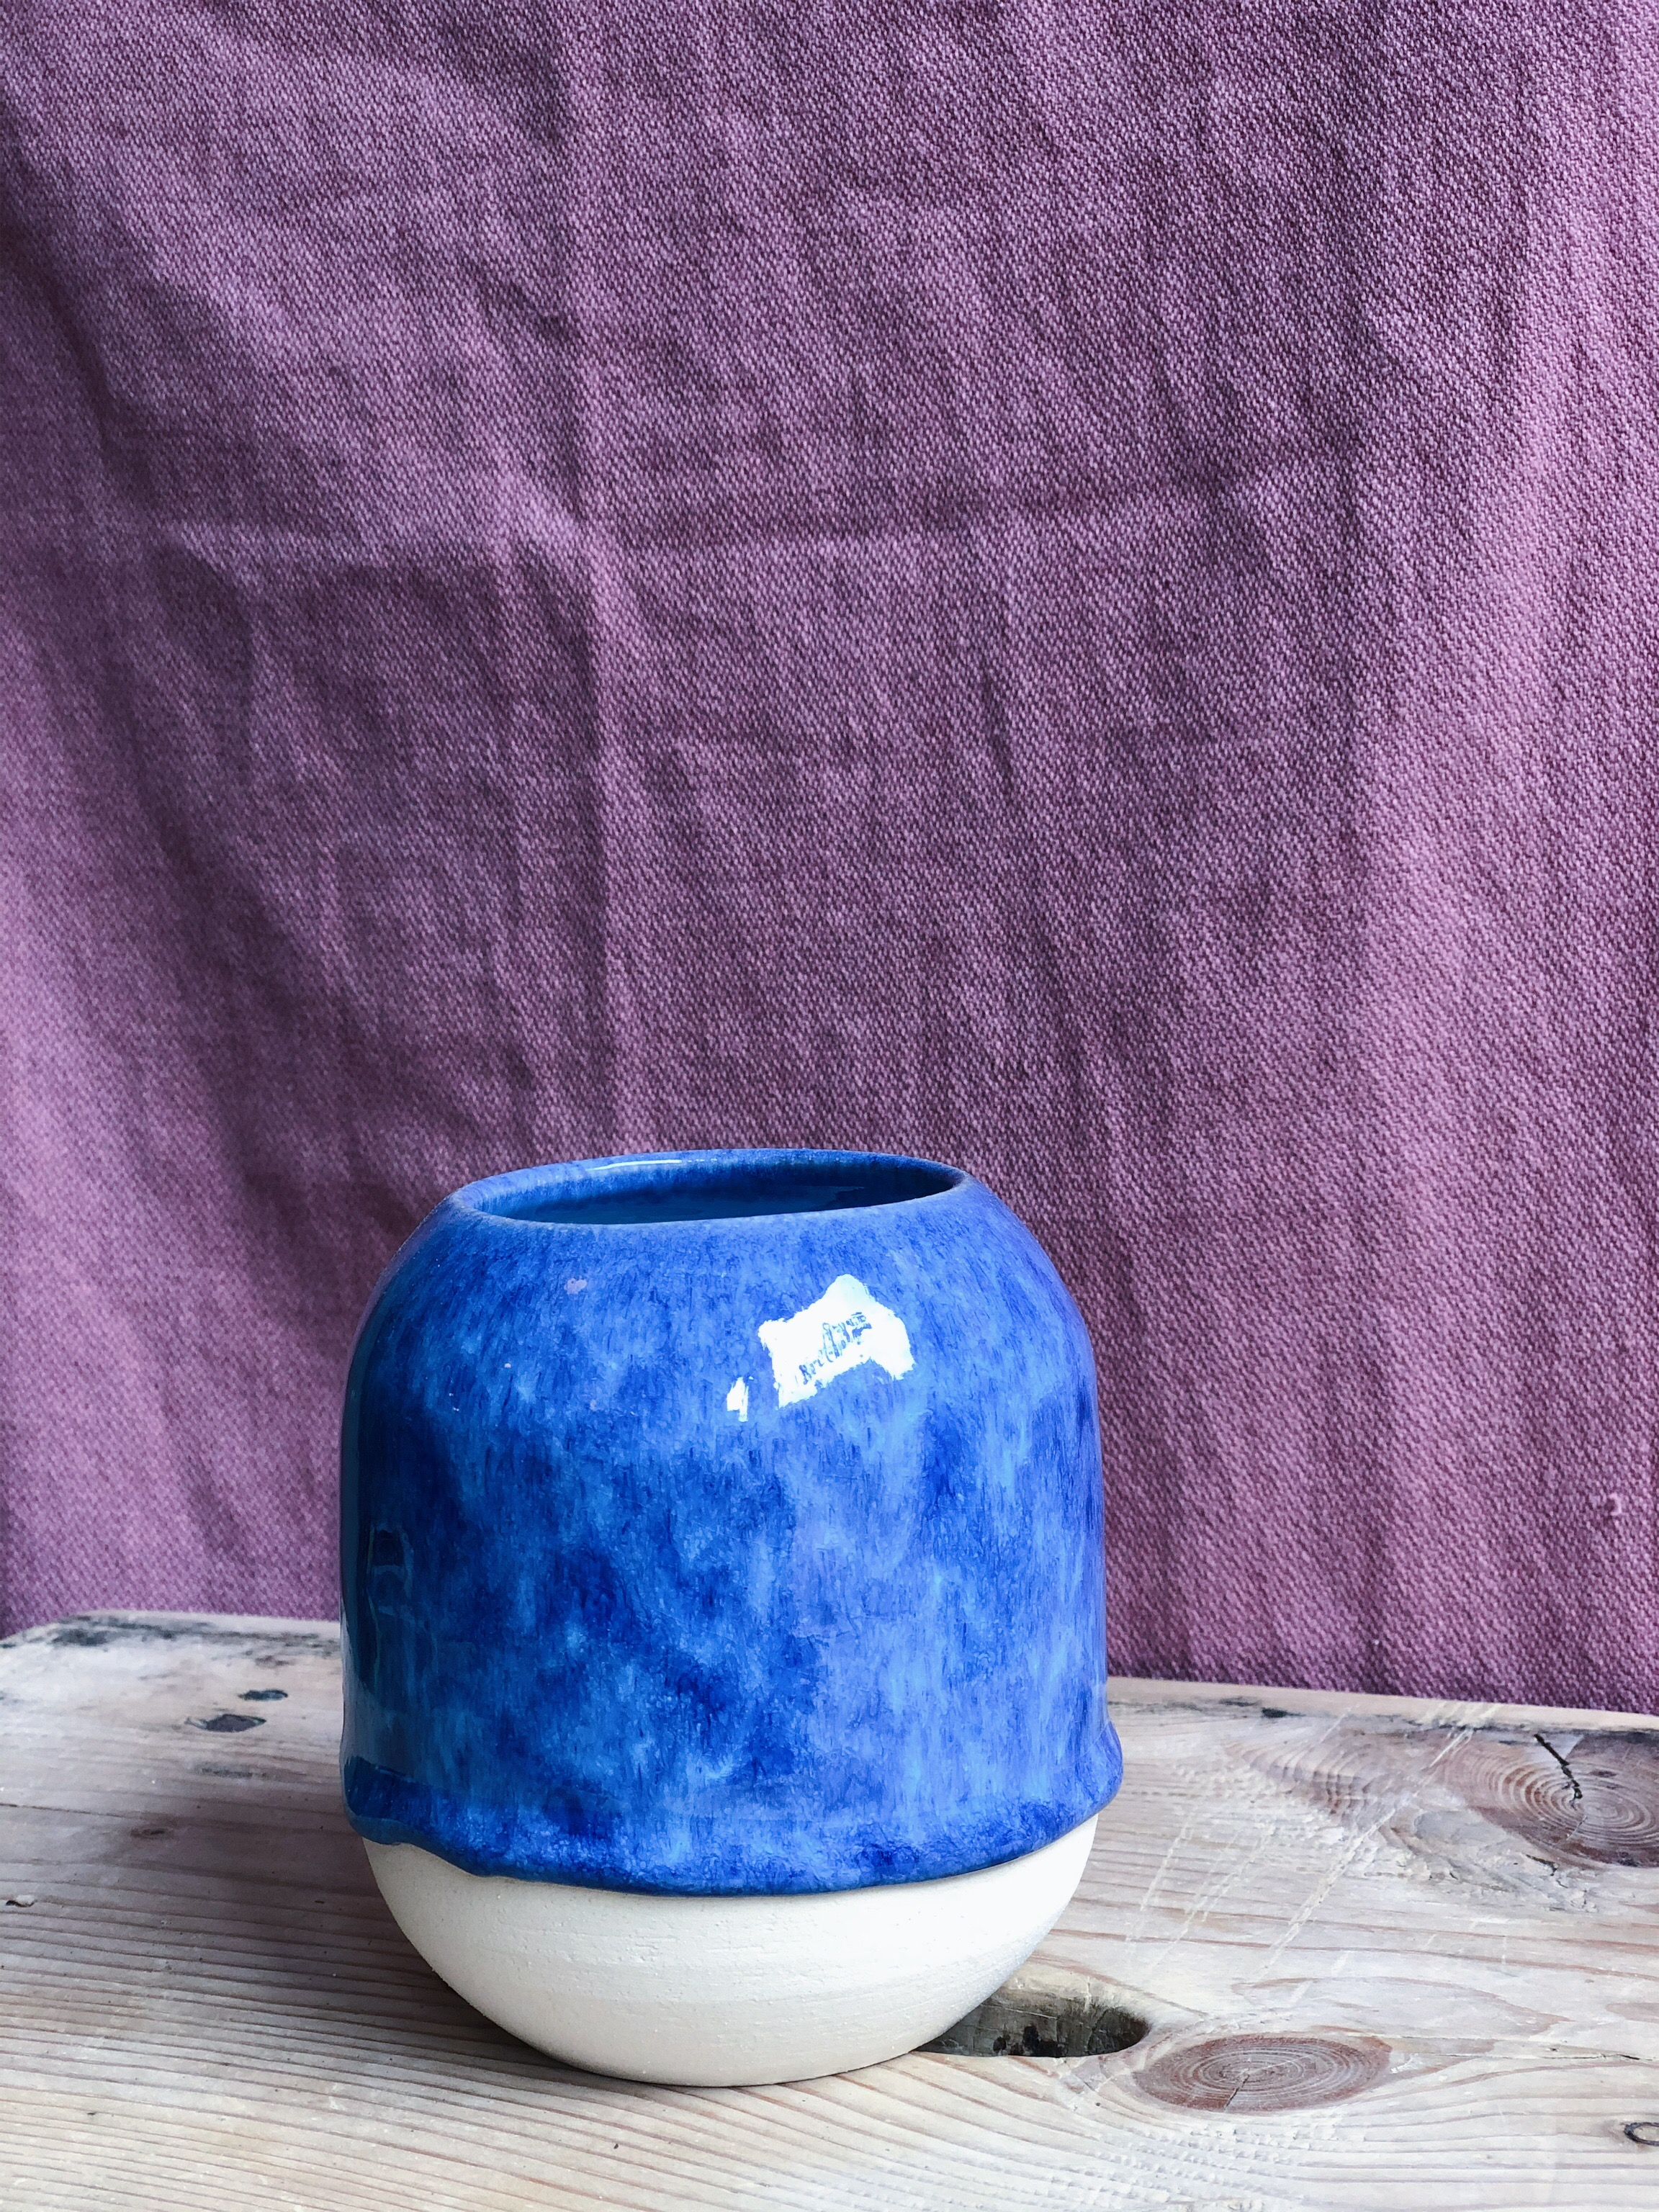 STUDIO ARHØJ - Pen Cup, Tide Pool